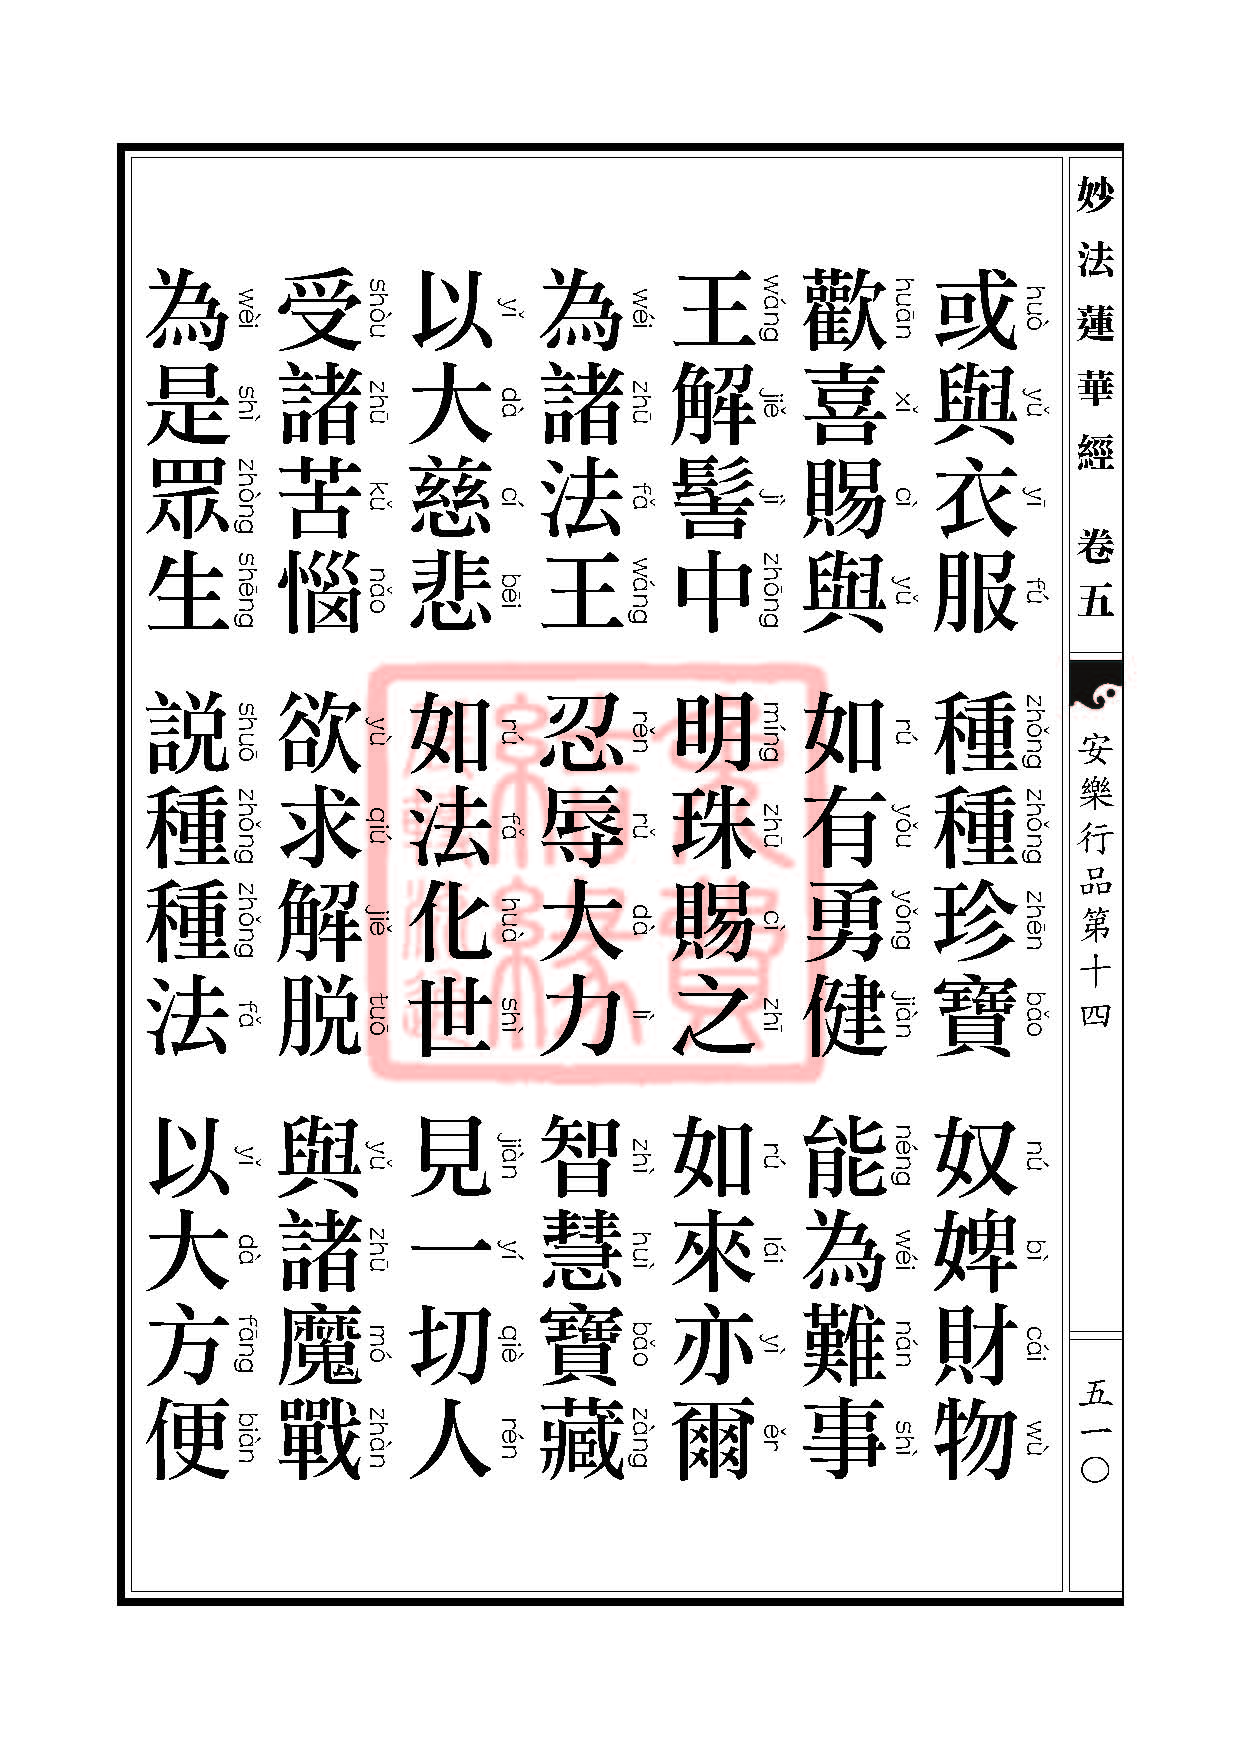 Book_FHJ_HK-A6-PY_Web_页面_510.jpg